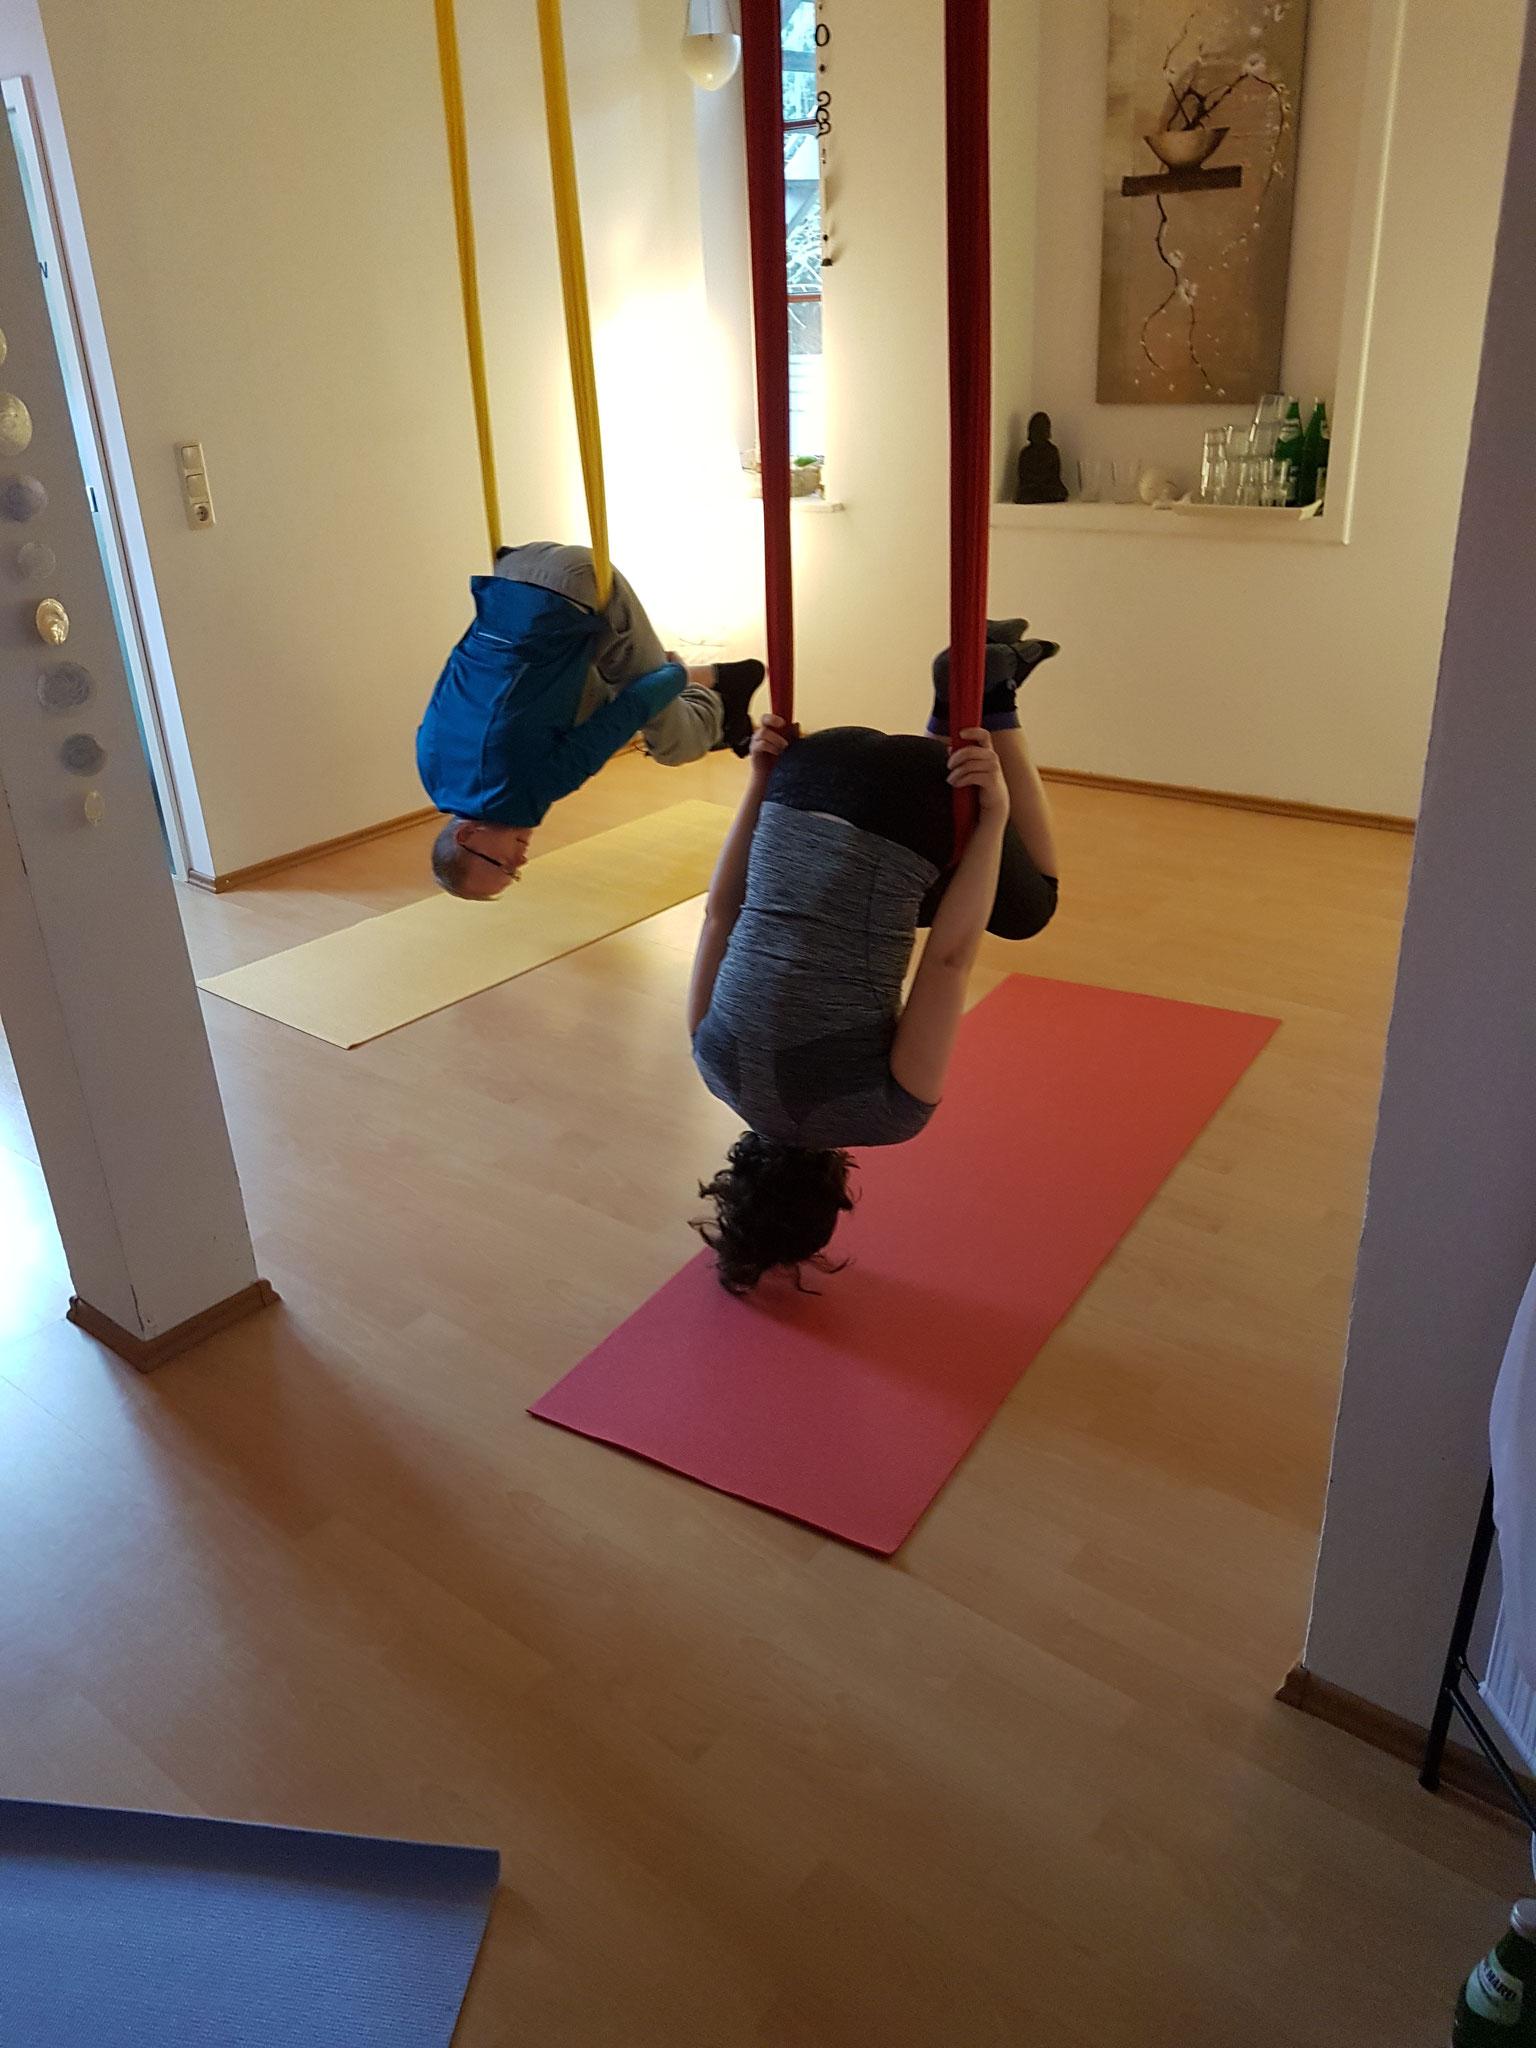 AERIAL YOGA - Paare im Yoga Tuch